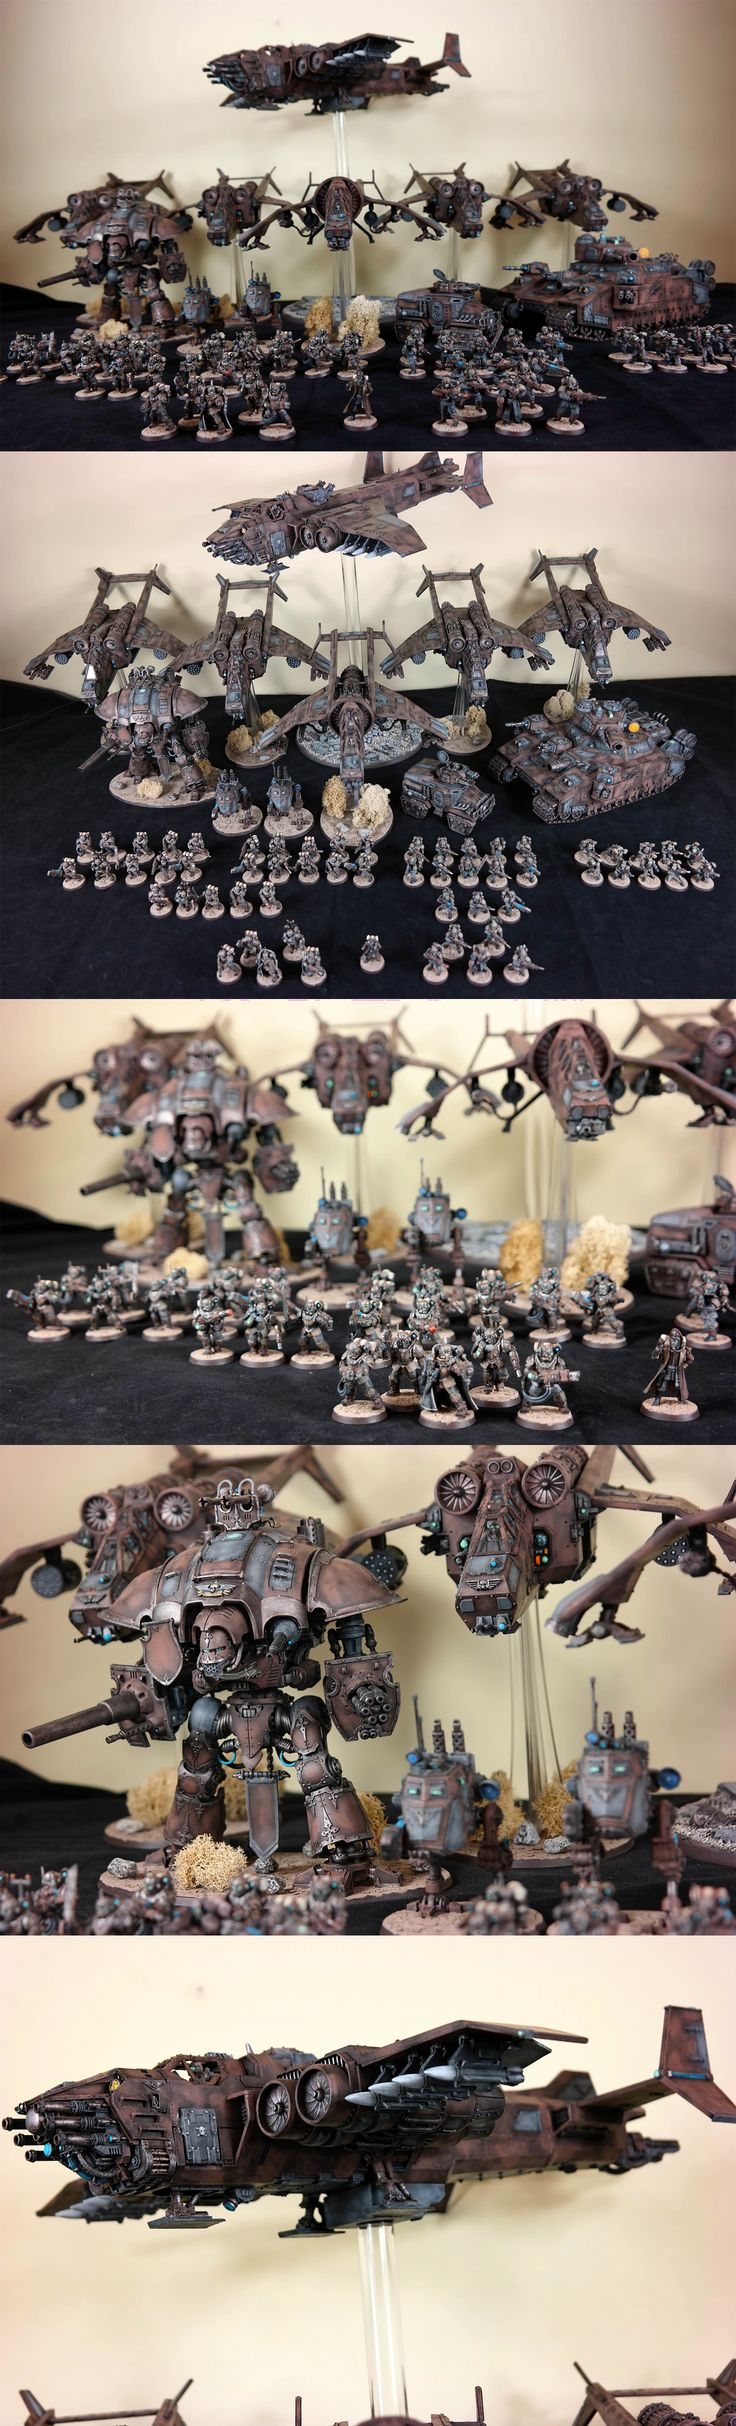 Current Army Picture - Astra Militarum, Militarum Tempestus Scions, Elysian Drop Troops: Air Cavalry || Regiment: Lions of Leander VI || Warhammer 40k